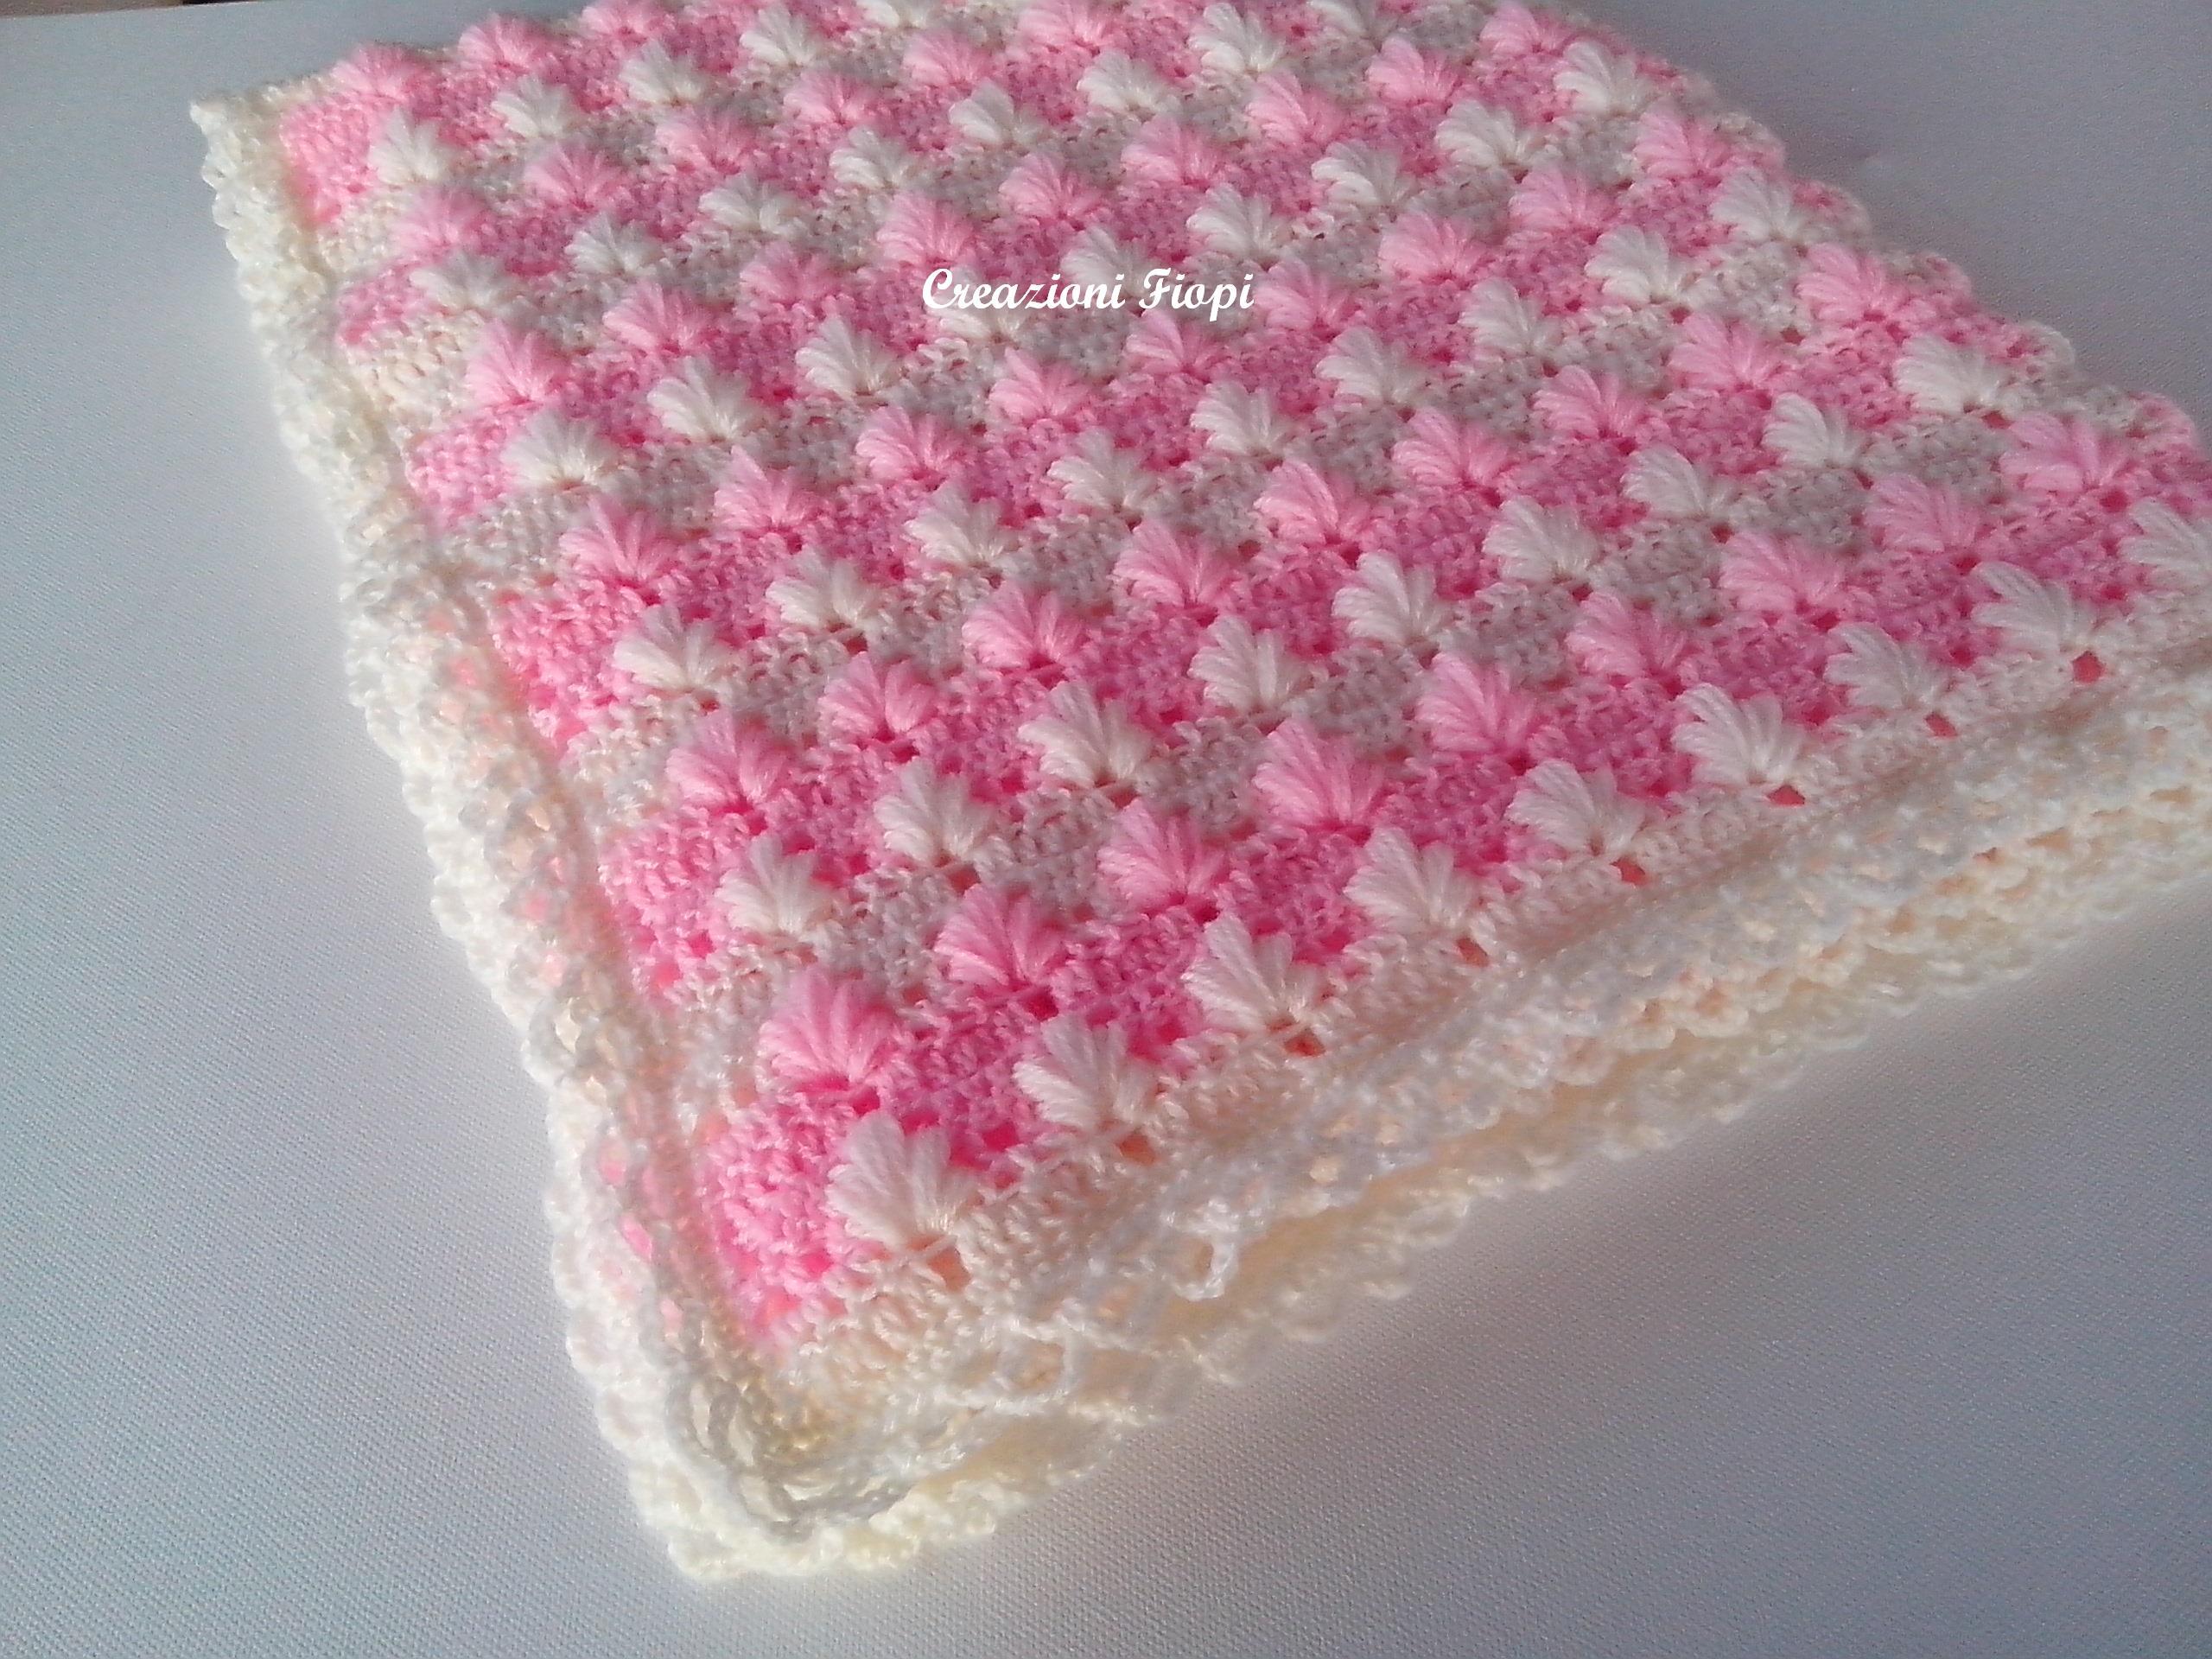 Baby blanket puff aloe stitch by creazionifiopi on deviantart creazionifiopi baby blanket puff aloe stitch by creazionifiopi baditri Image collections